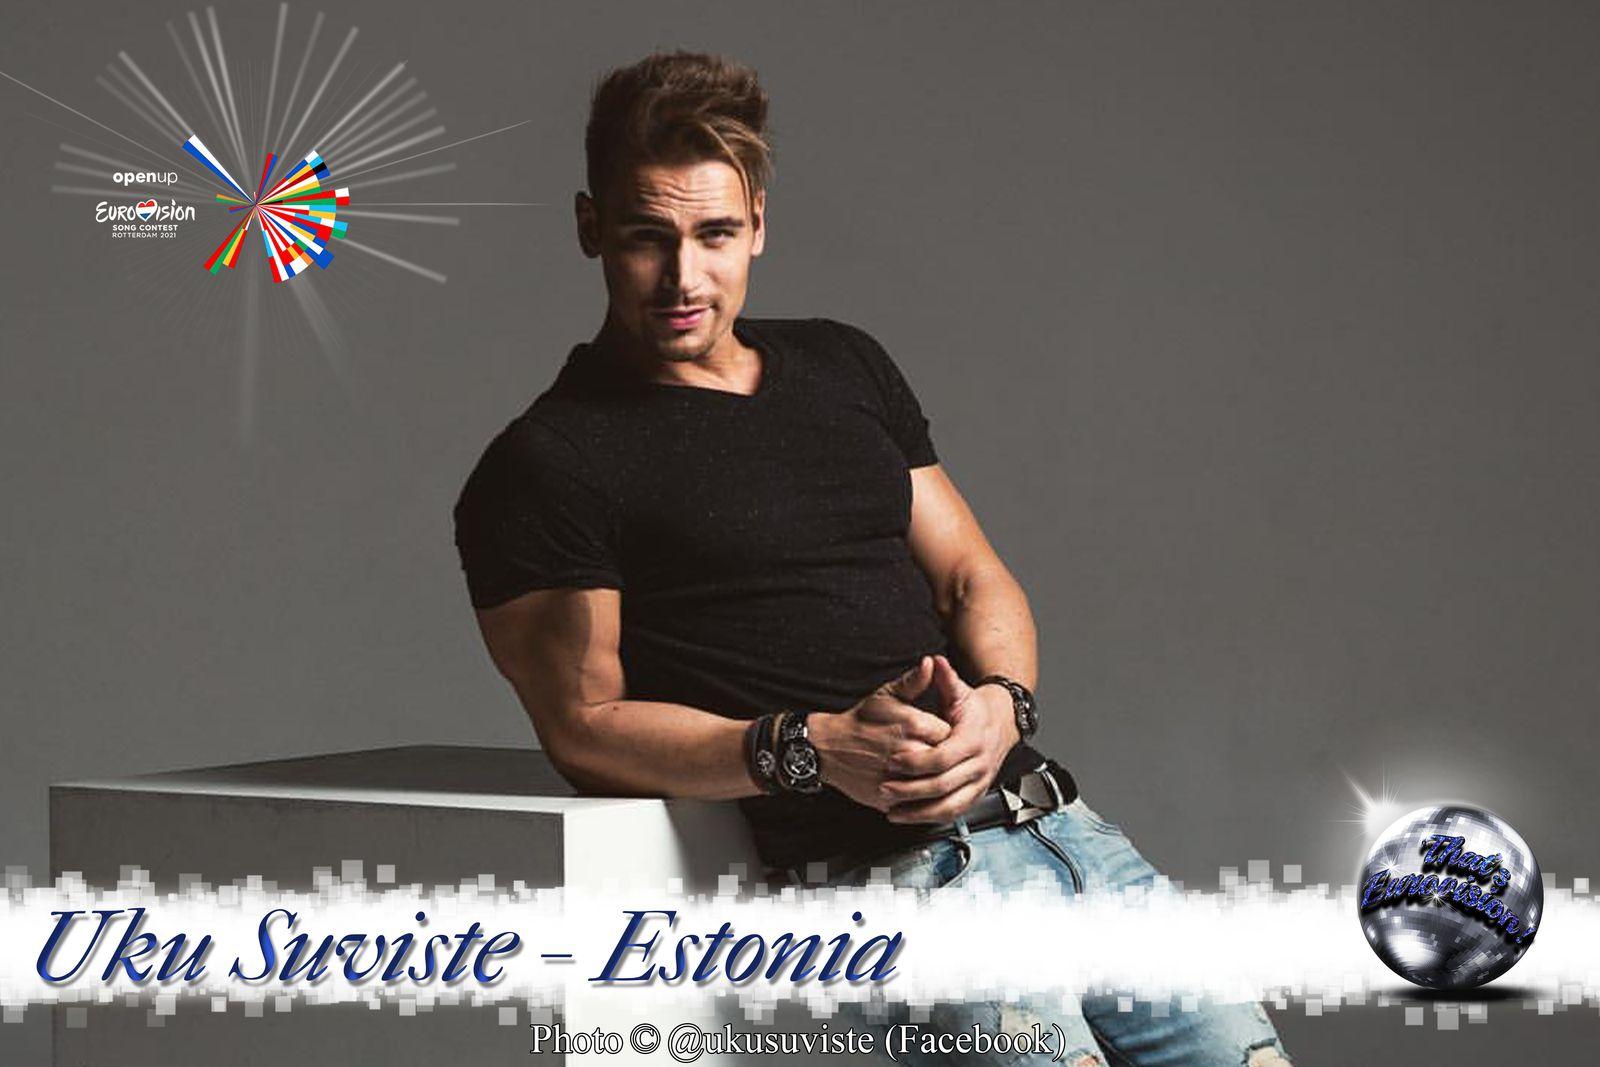 Estonia 2021 - Uku Suviste (The Lucky One)